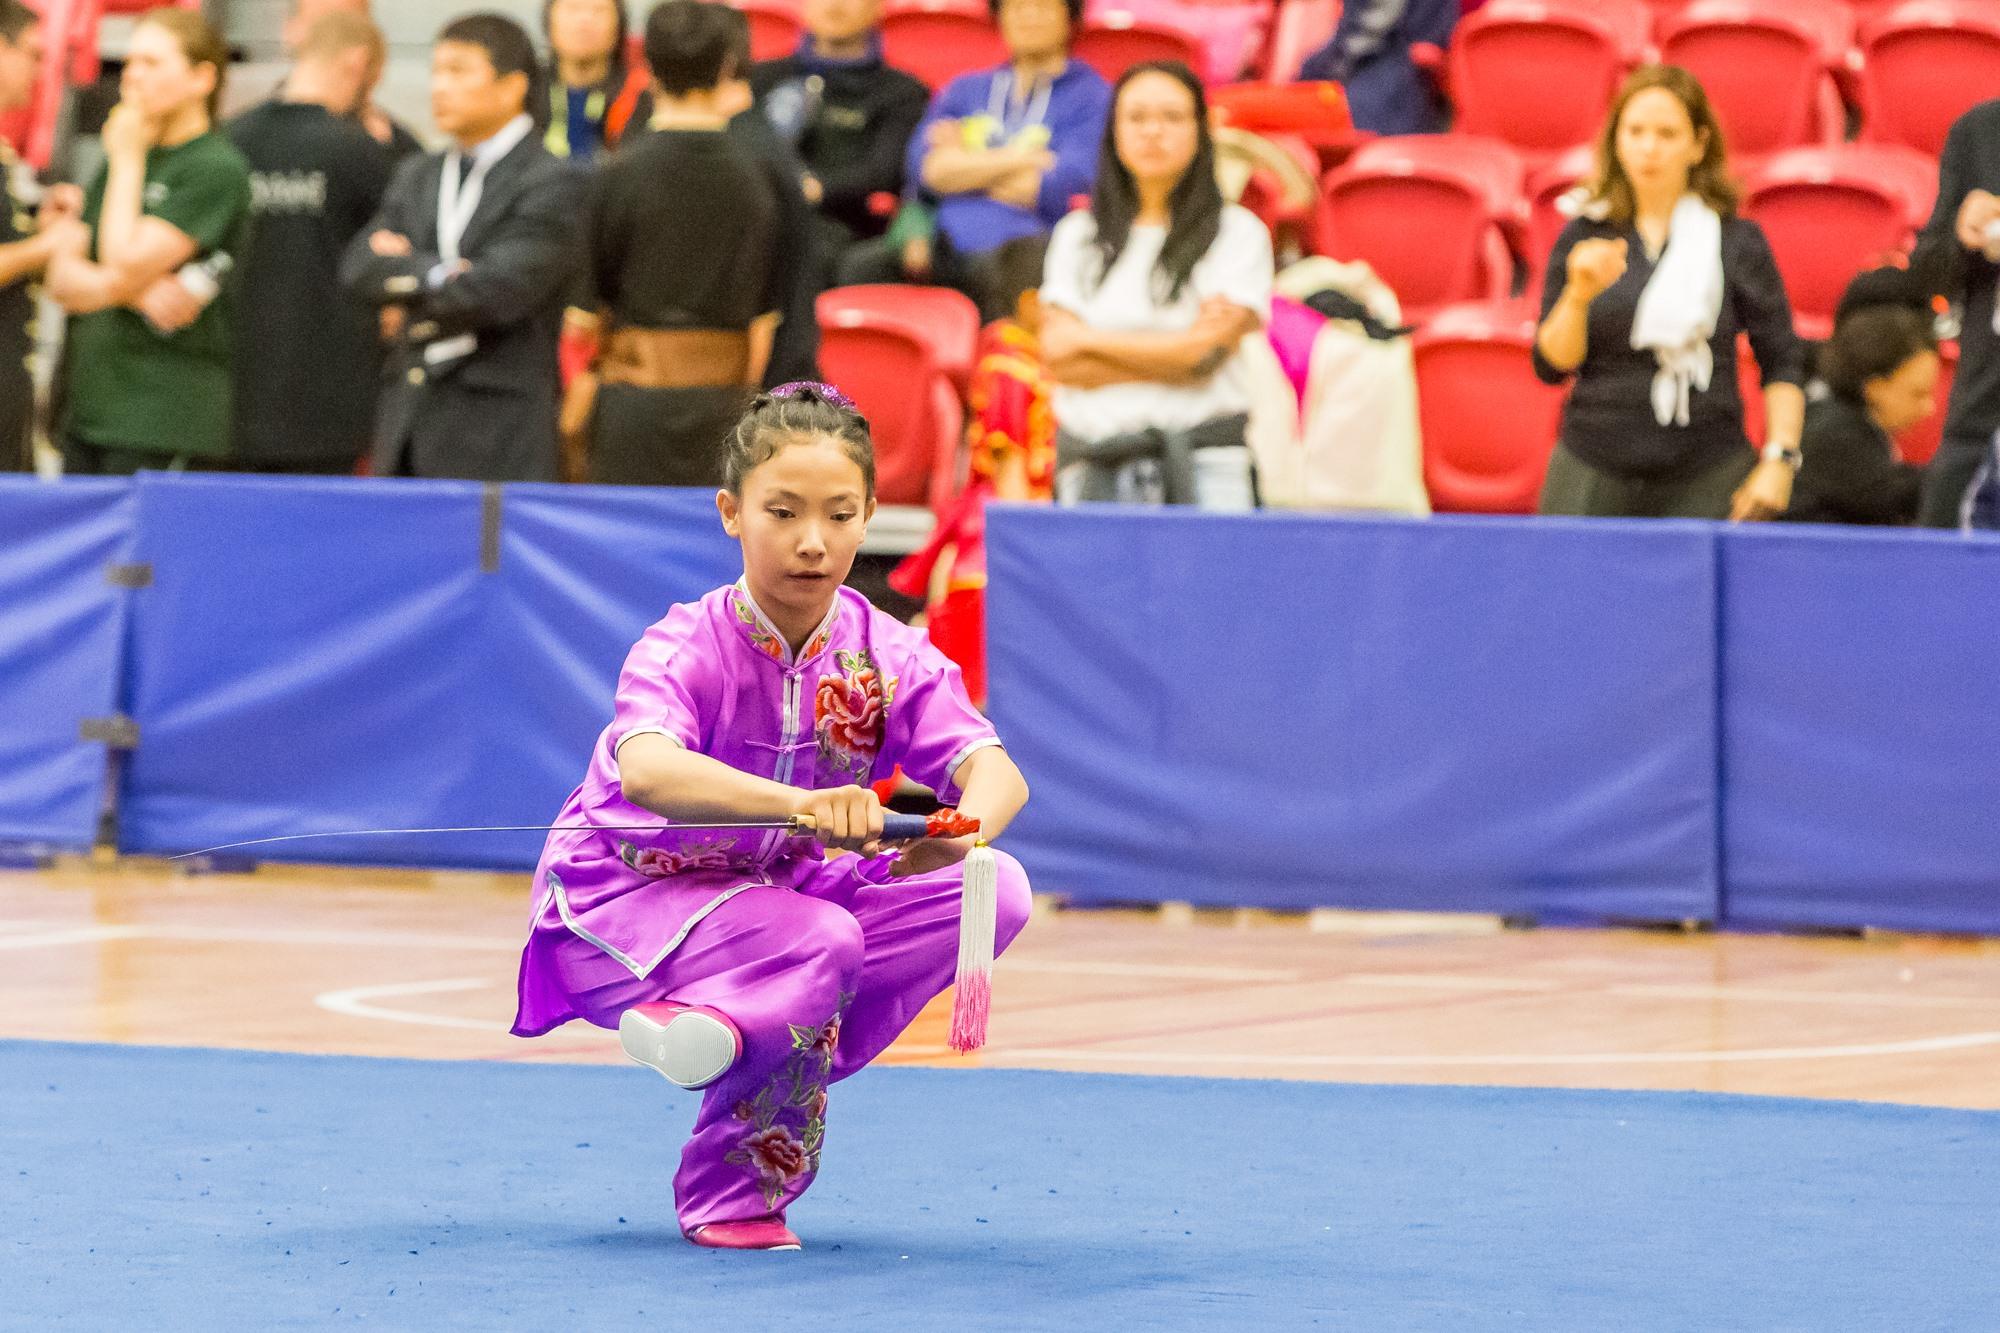 wayland-li-wushu-toronto-markham-canadian-wushu-championships-2017-jianshu-14.jpg